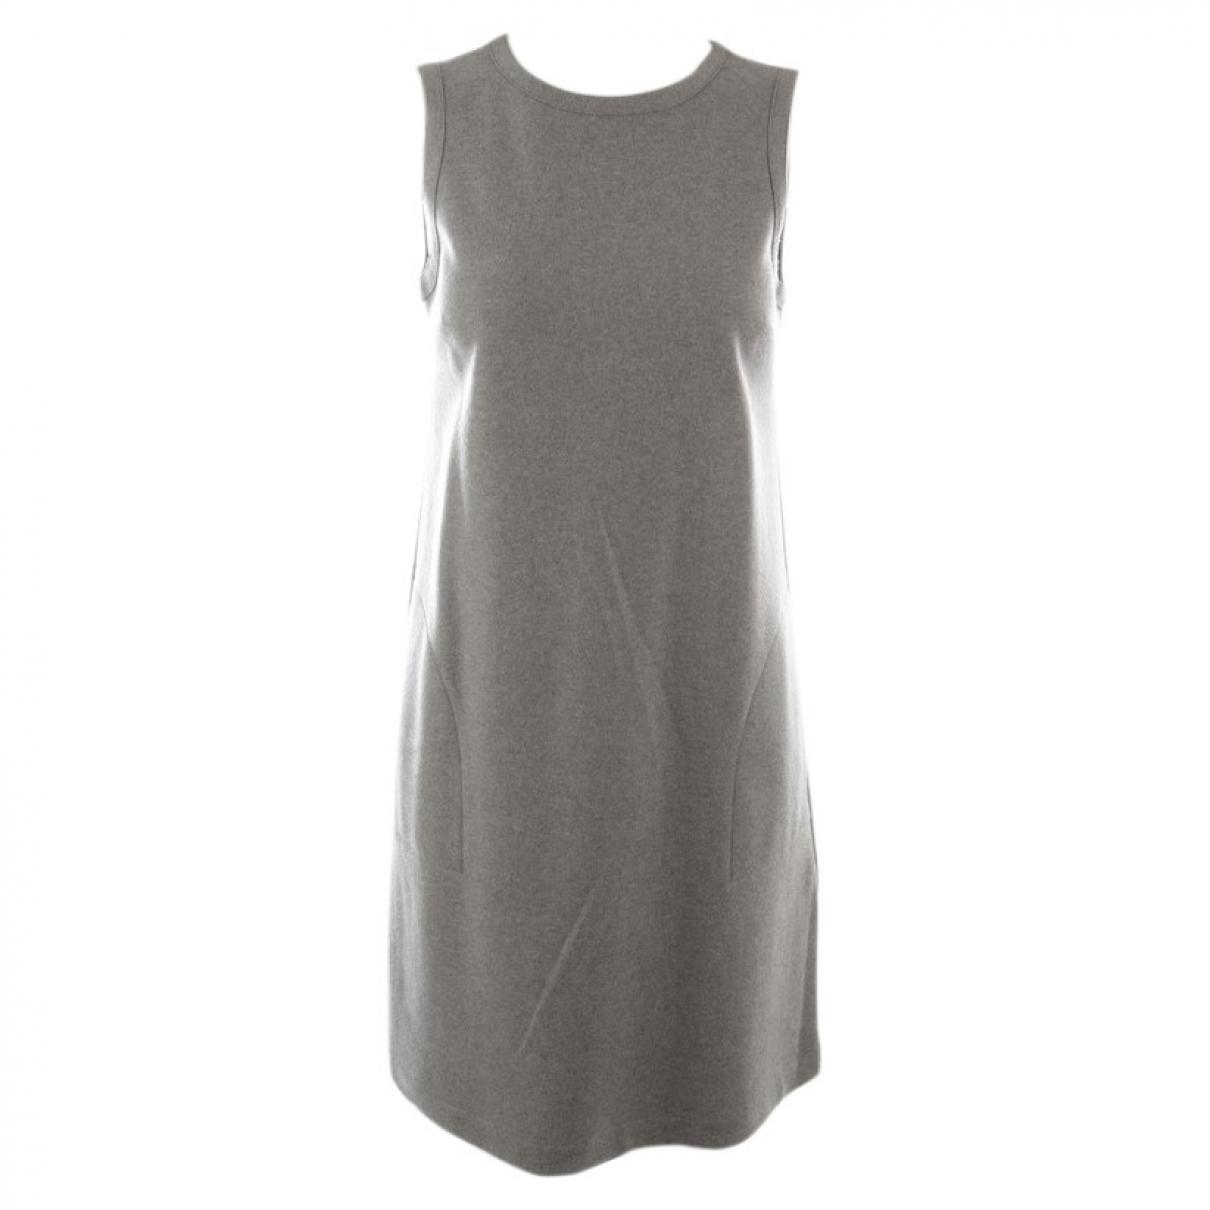 Brunello Cucinelli \N Green Wool dress for Women S International